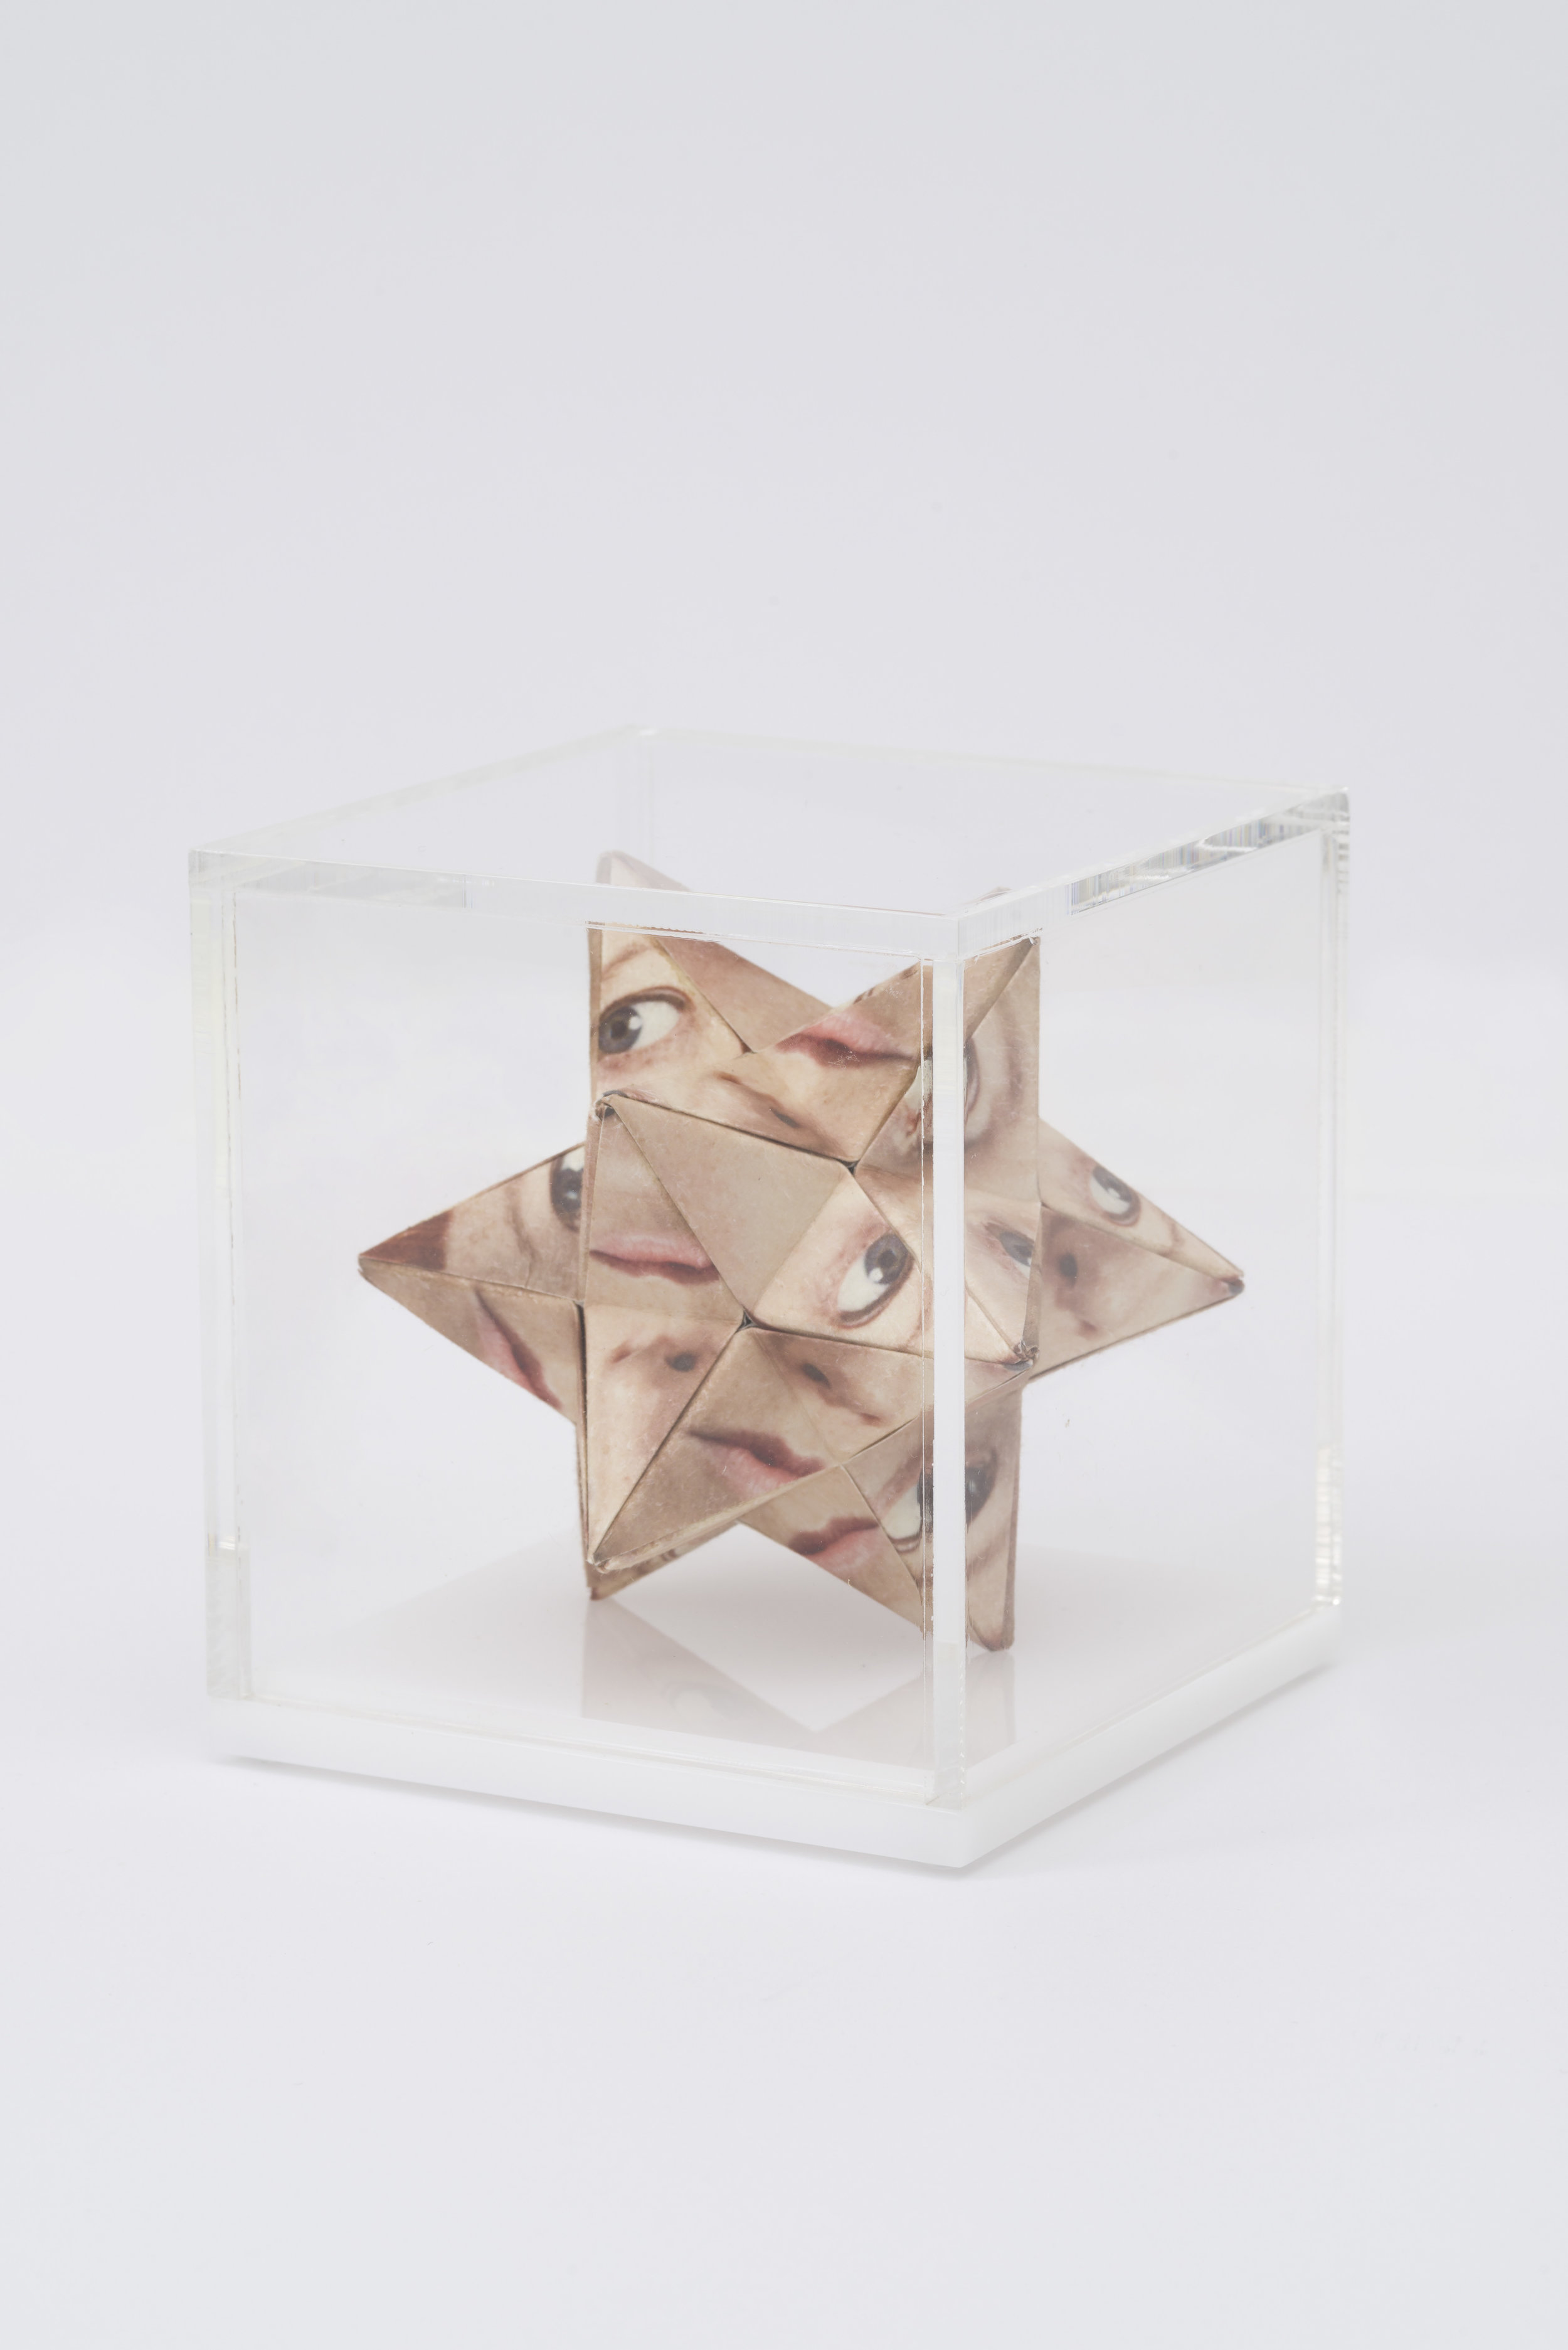 Alma Haser,  Prototype No. 36 (Zoniel) , 2016  Digital pigment print with folded digital pigment print sculpture, plexiglass box, 12 x 12 x 12 cm (approx. 5 x 5 x 5 in), edition of 5   Inquire